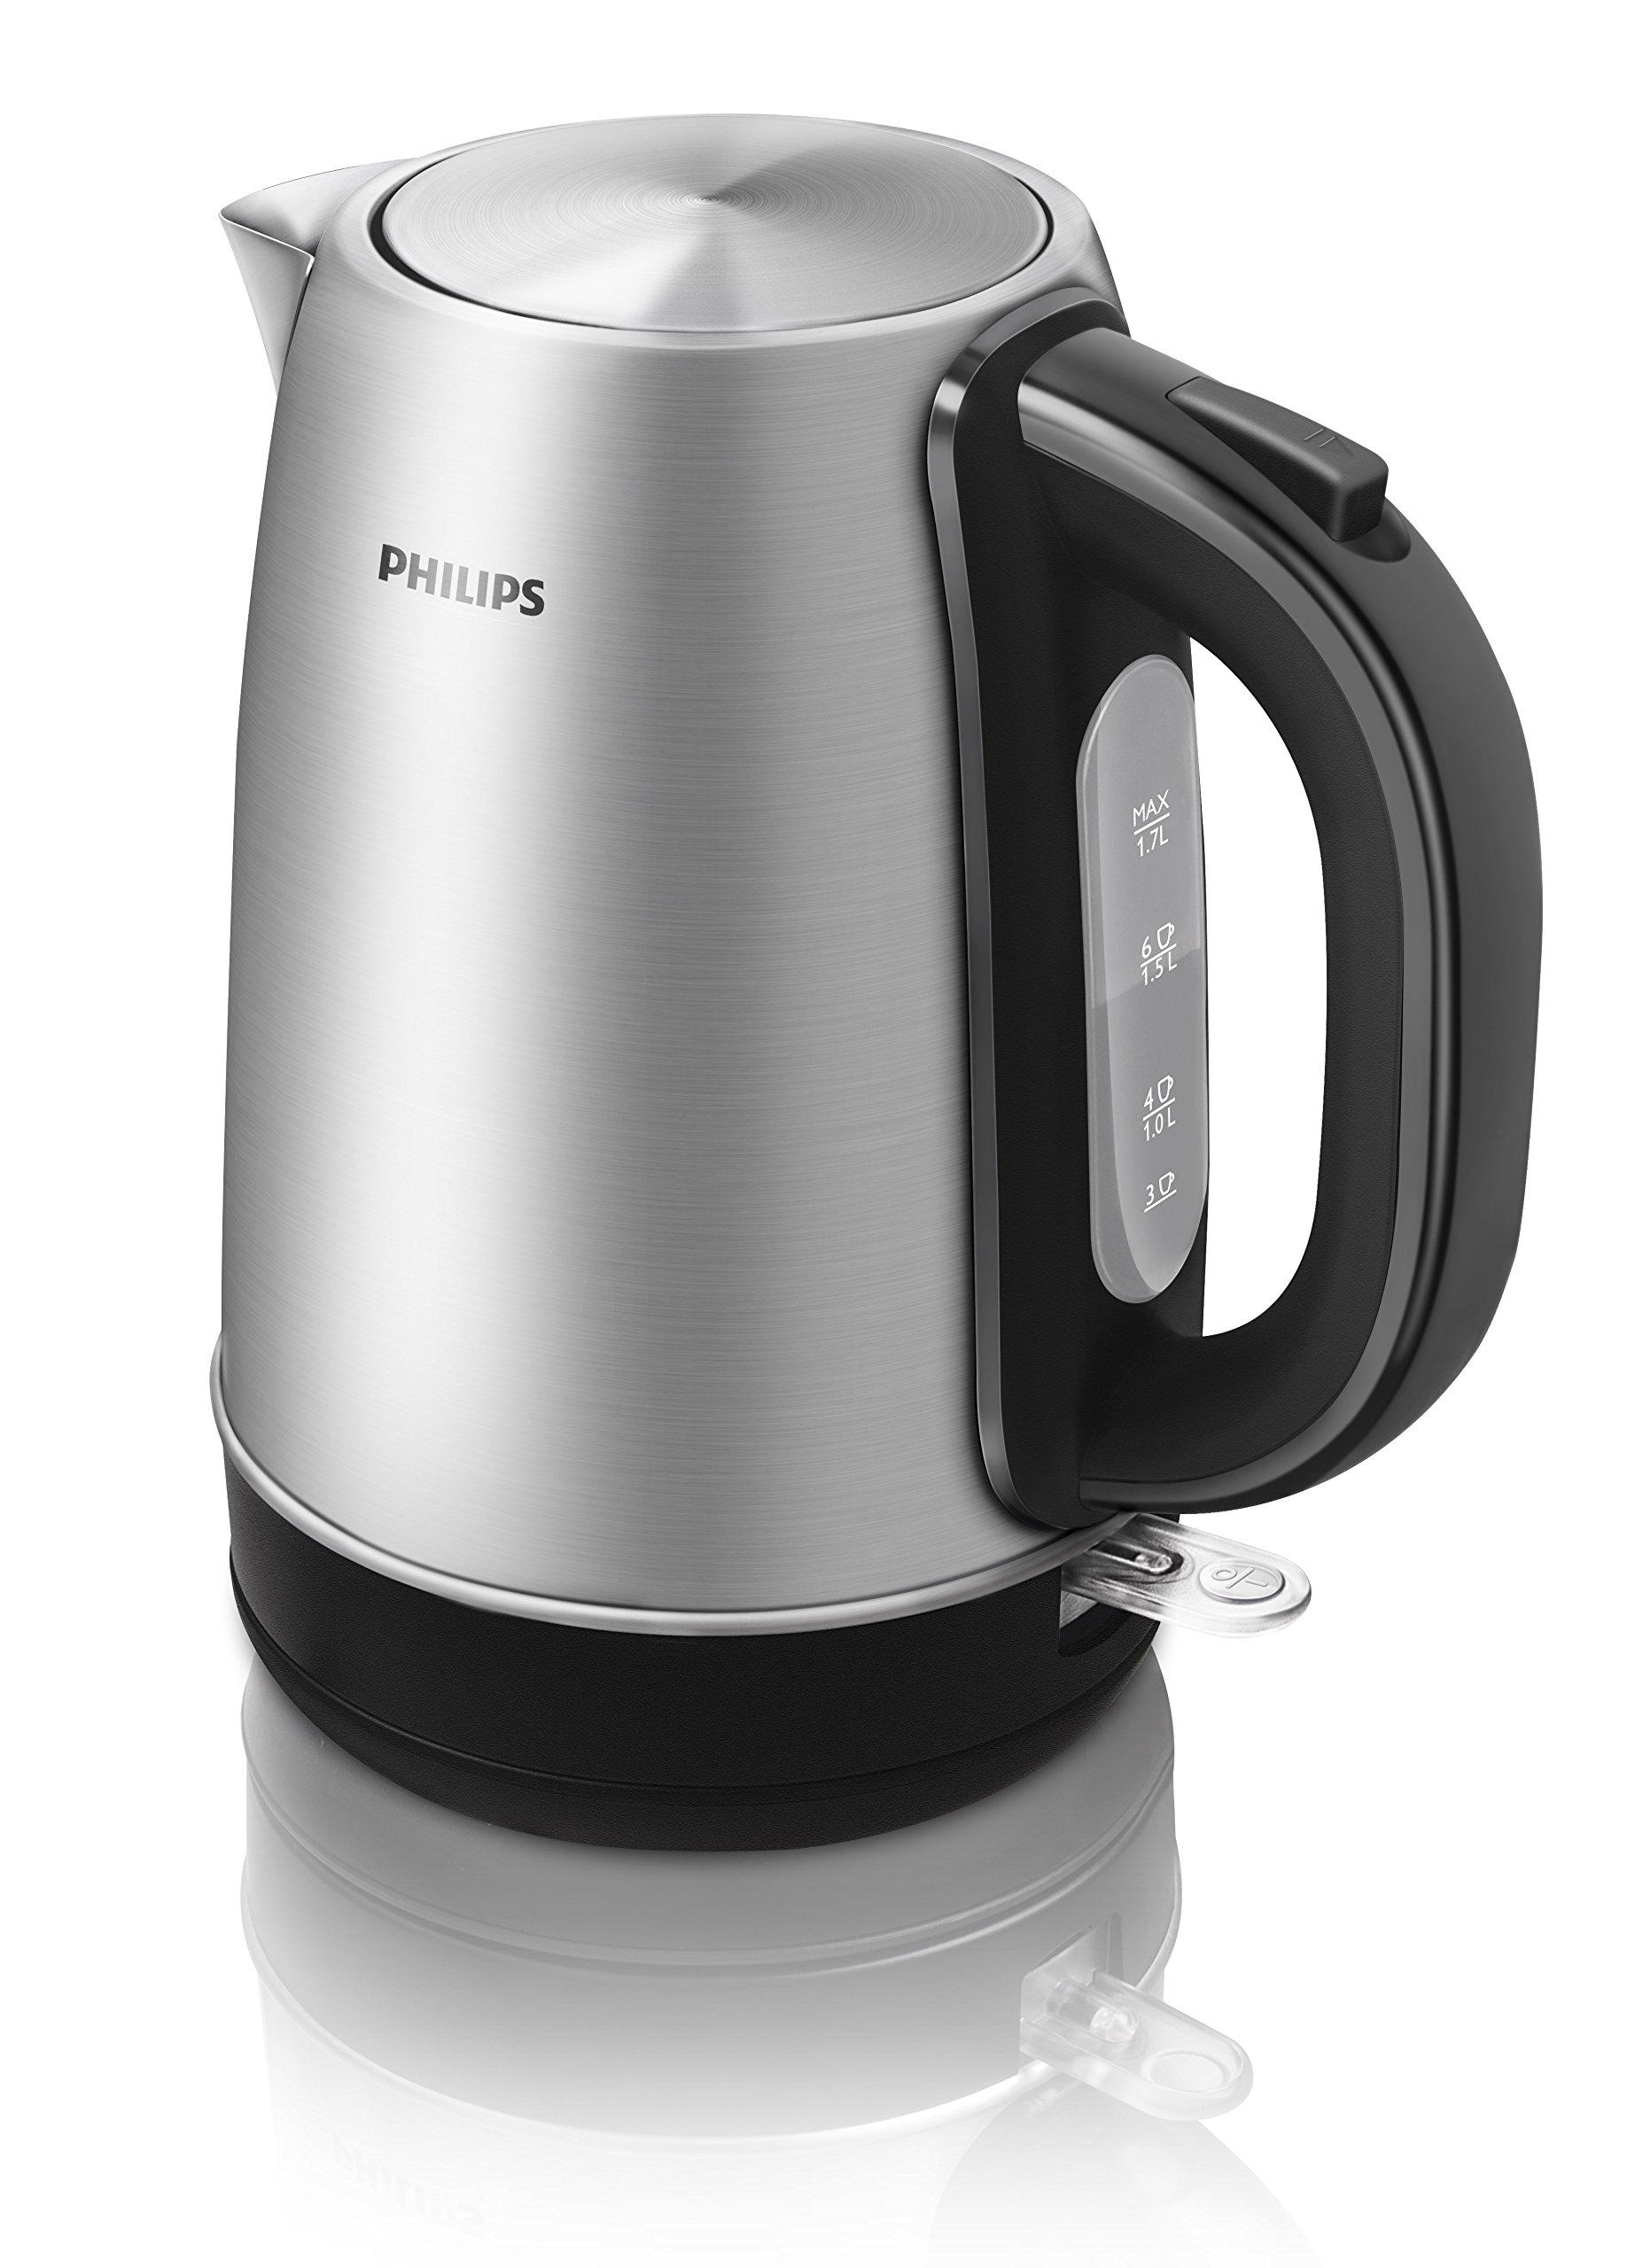 Philips-HD932120-Wasserkocher-aus-Edelstahl-17-L-2200-W-360-Grad-Pirouette-Silber